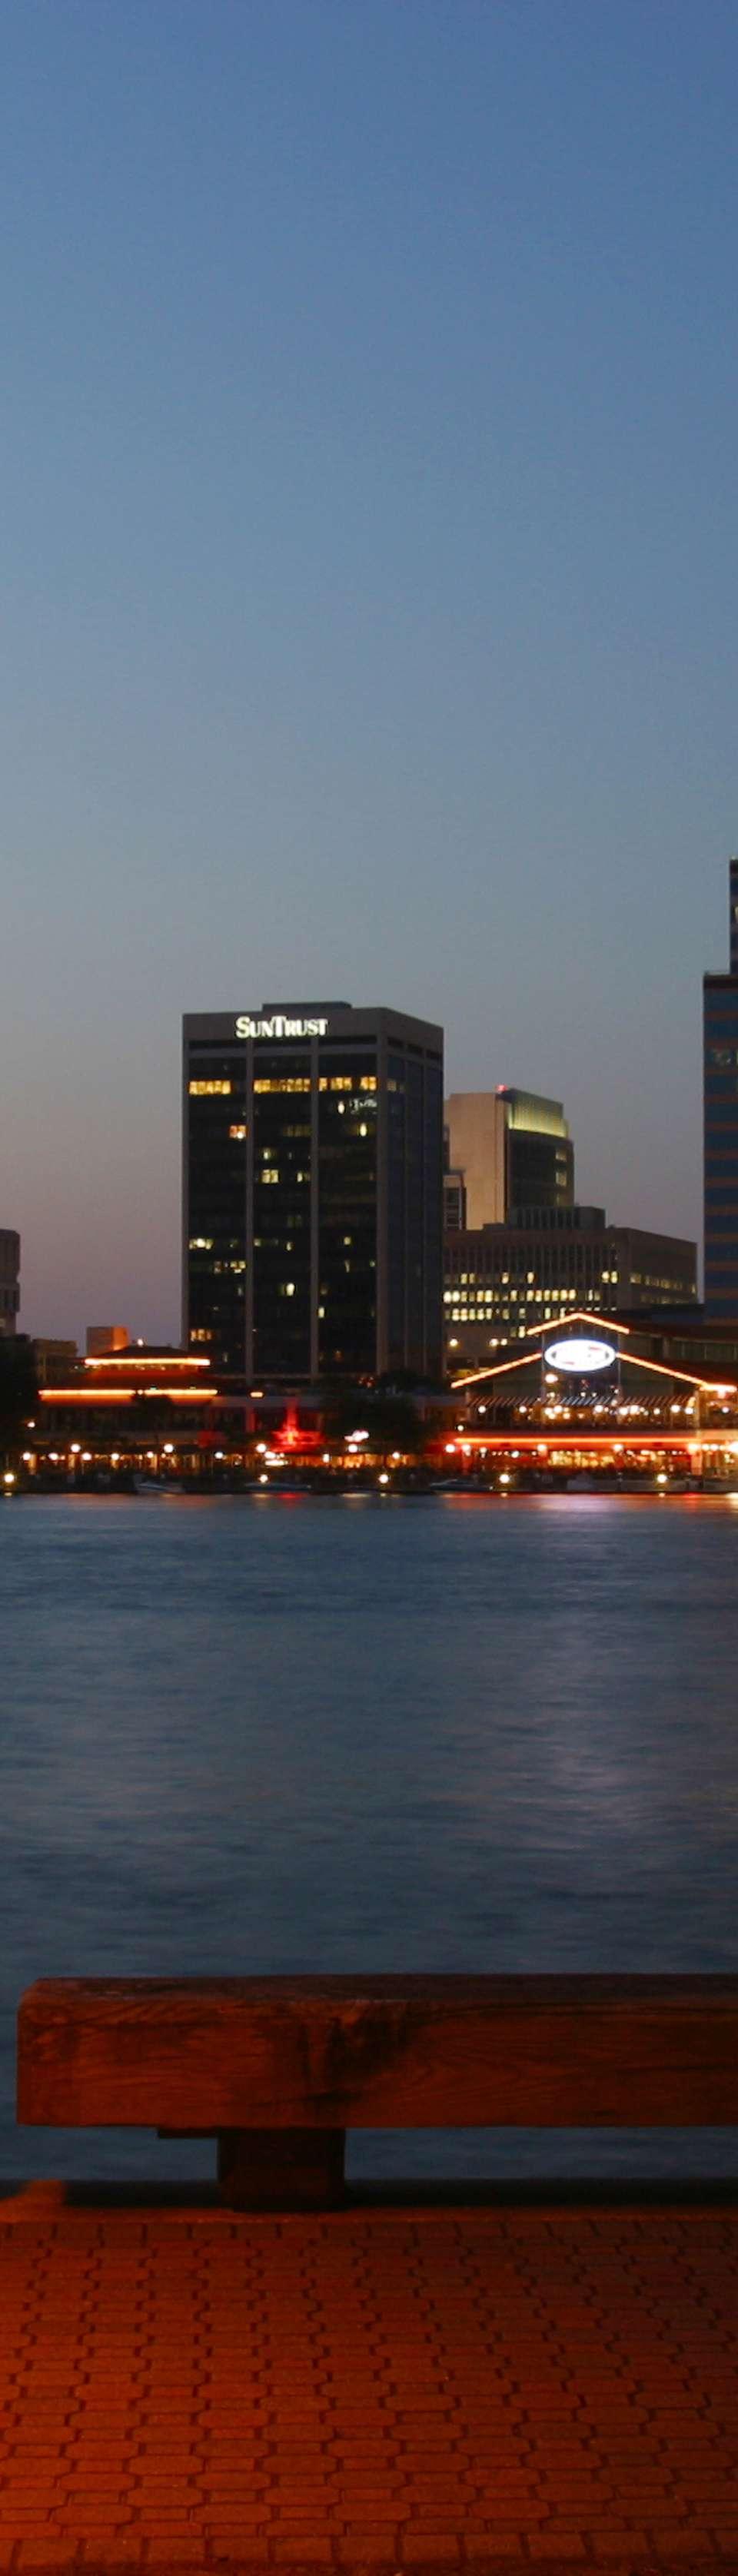 Downtown Jacksonville's Southbank skyline at dusk